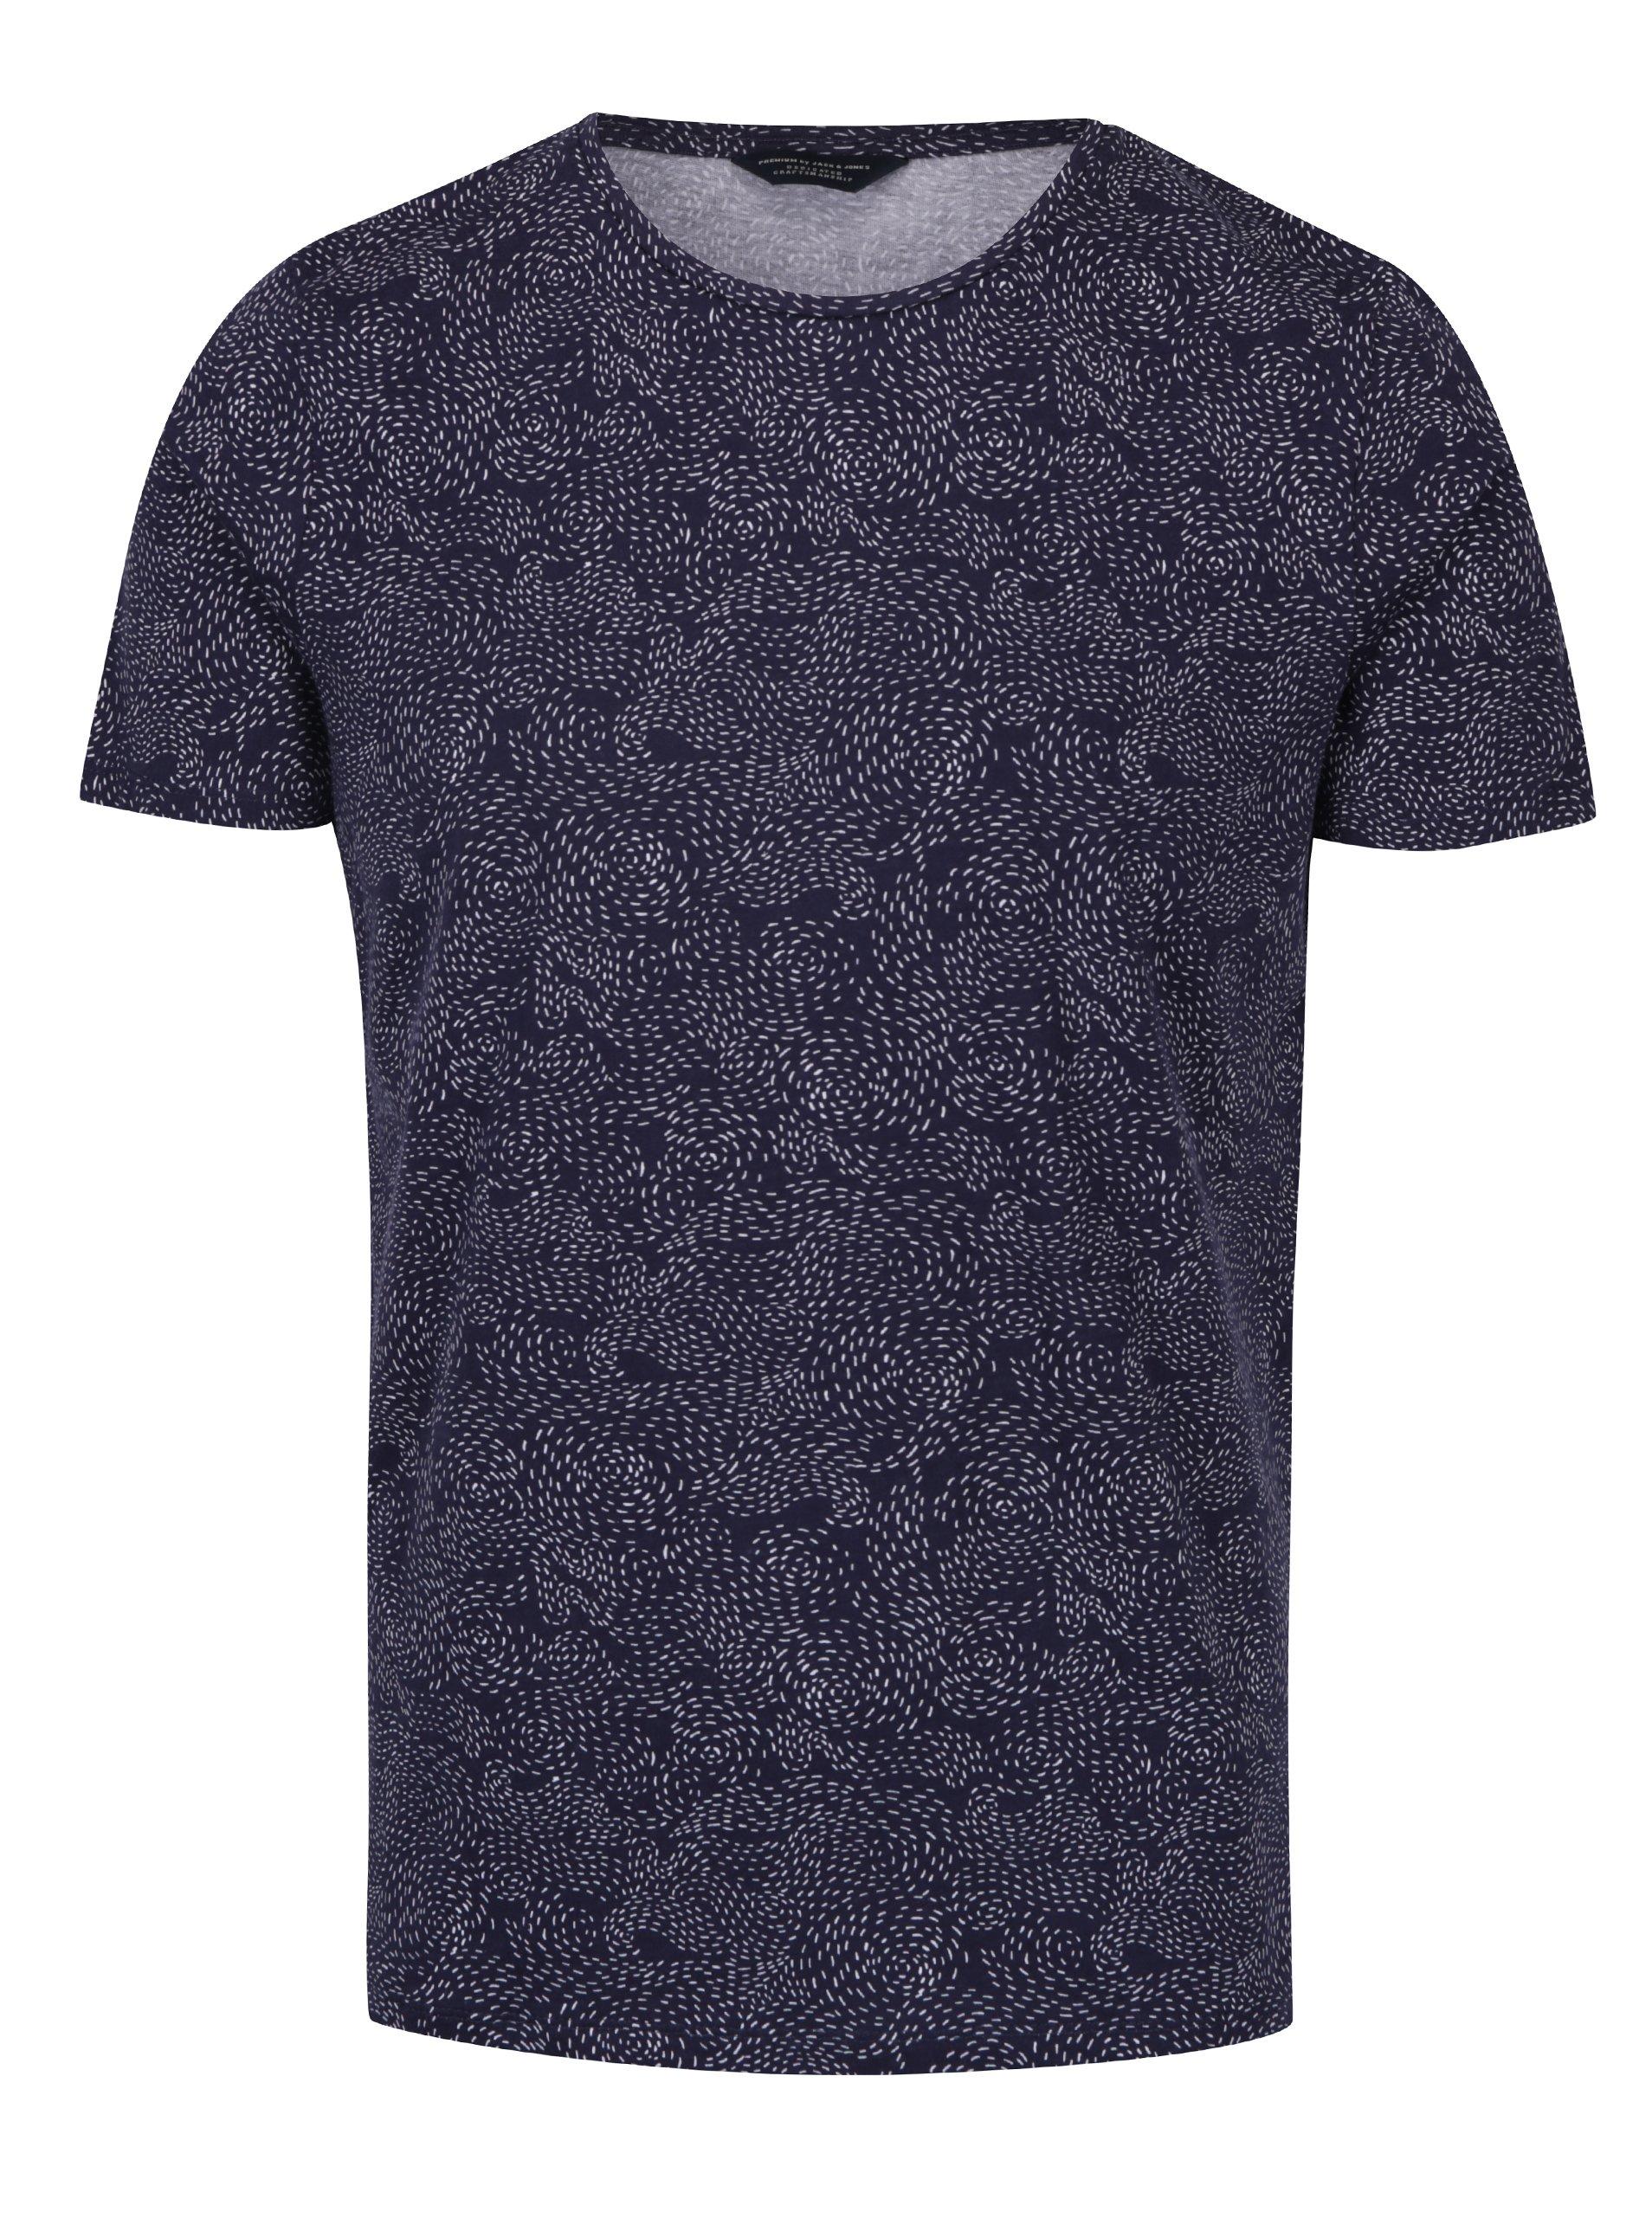 Tmavě modré vzorované tričko Jack & Jones Premium Linear